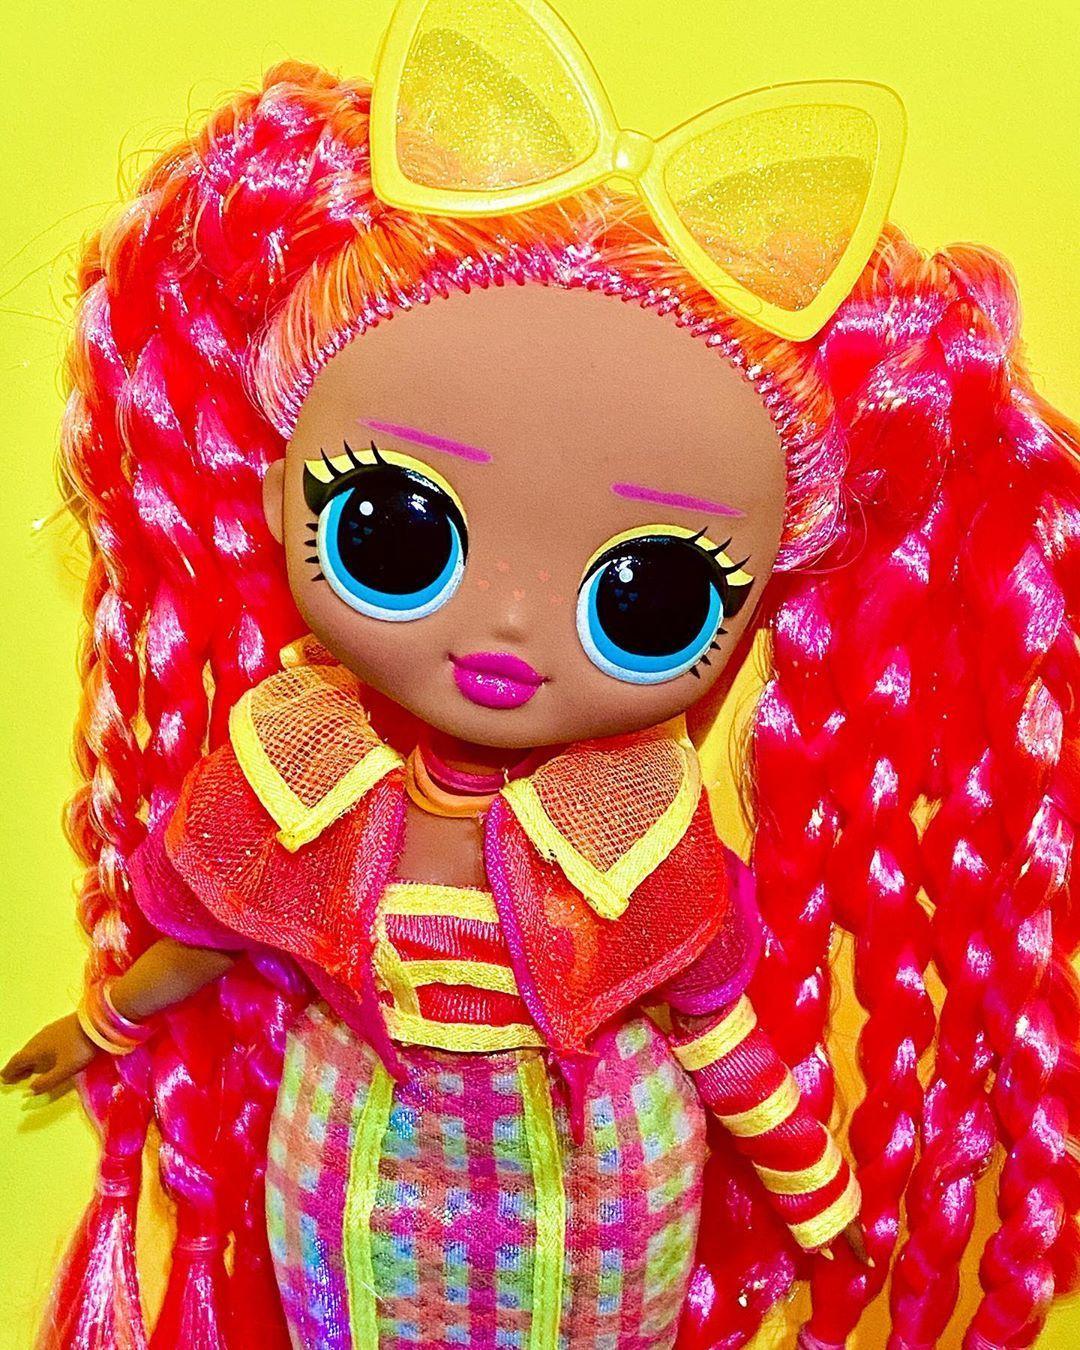 Lol Omg Lights Novye Kukly Omg Lights Lol Omg Kukly Novye Omg Lol Dolls Pretty Dolls Doll Drawing